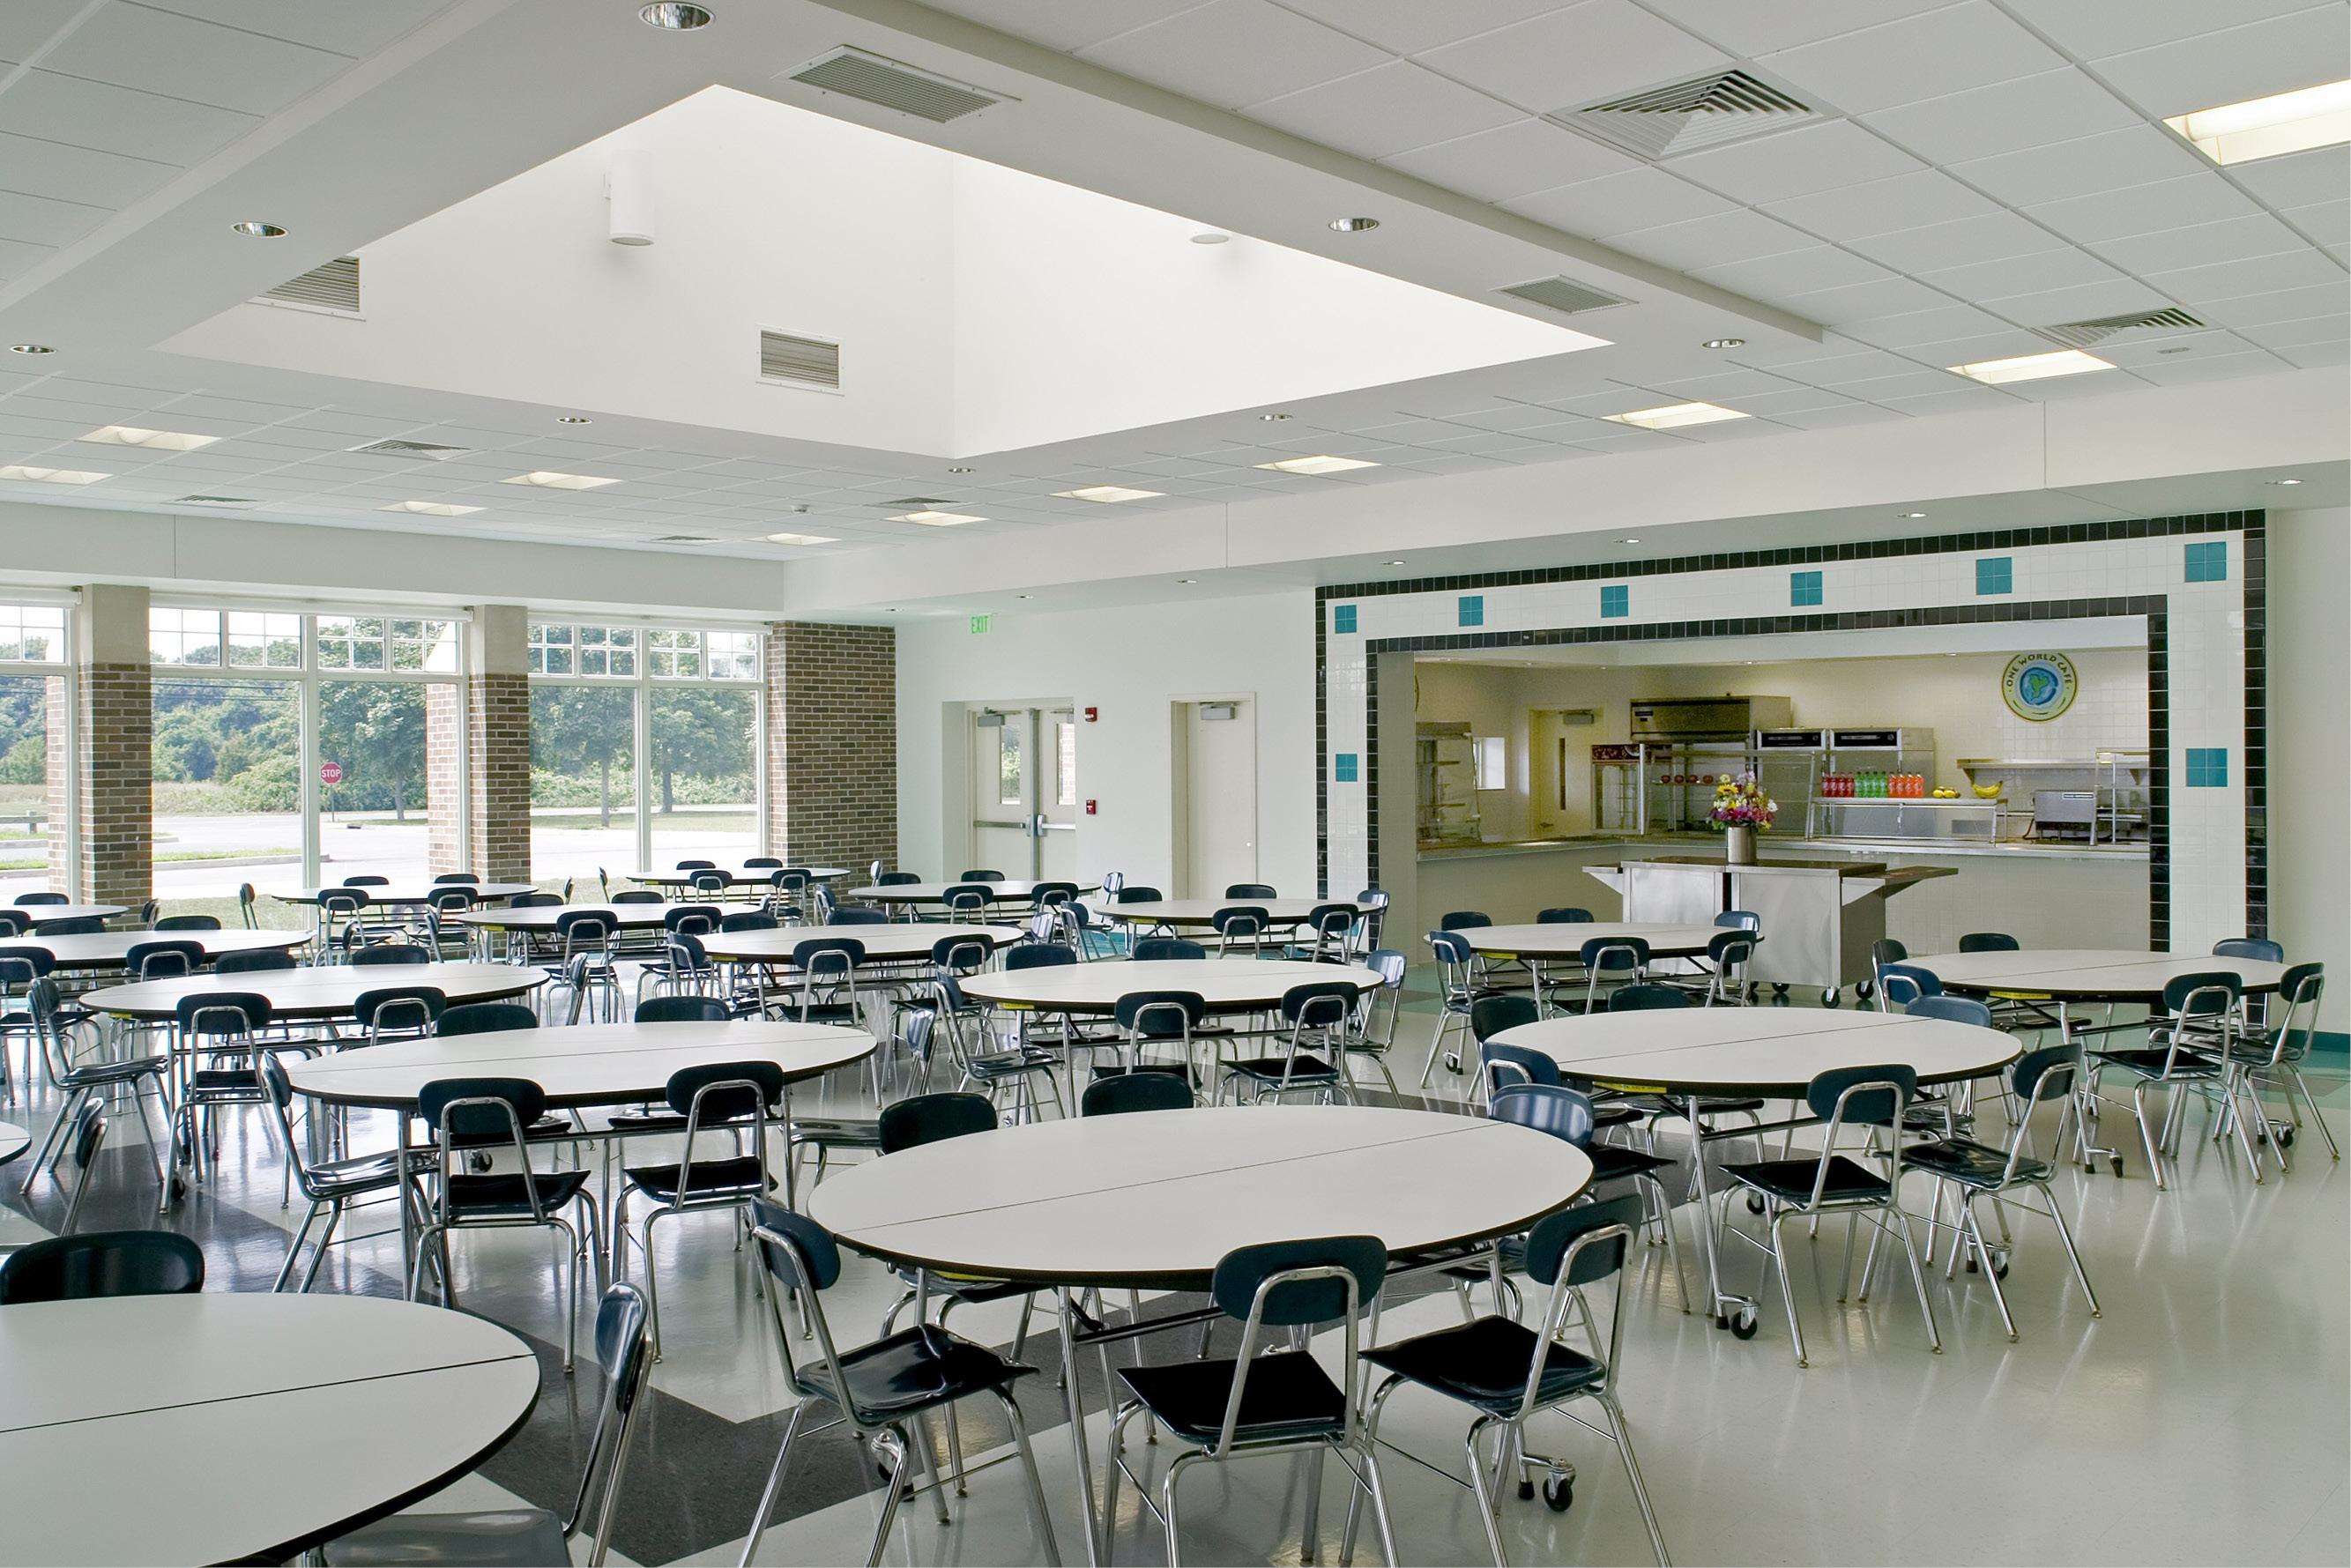 Center Moriches Union Free School District